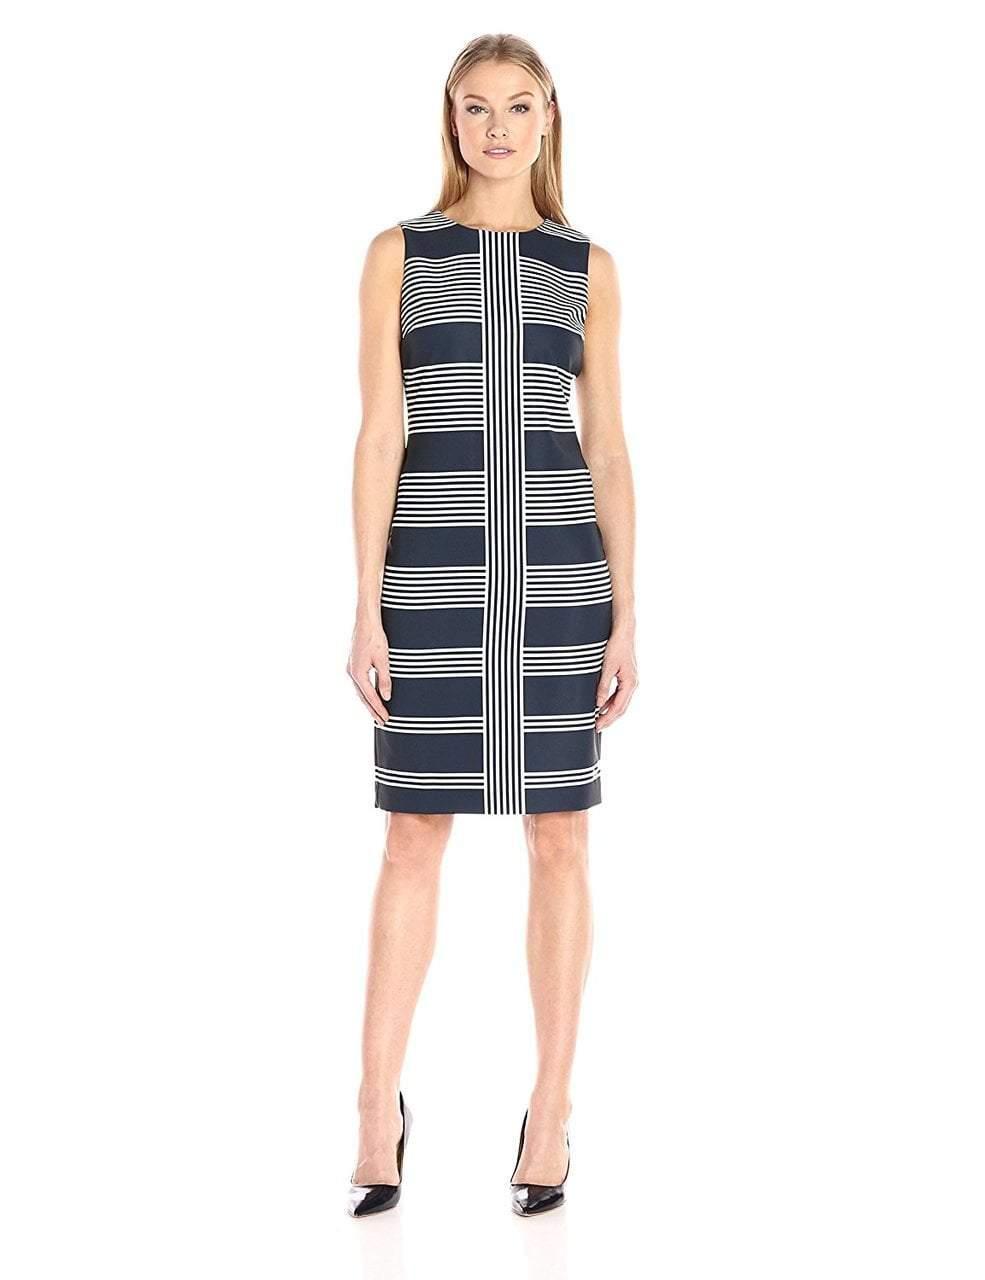 Taylor - Jewel Neck Sheath Dress 8687M